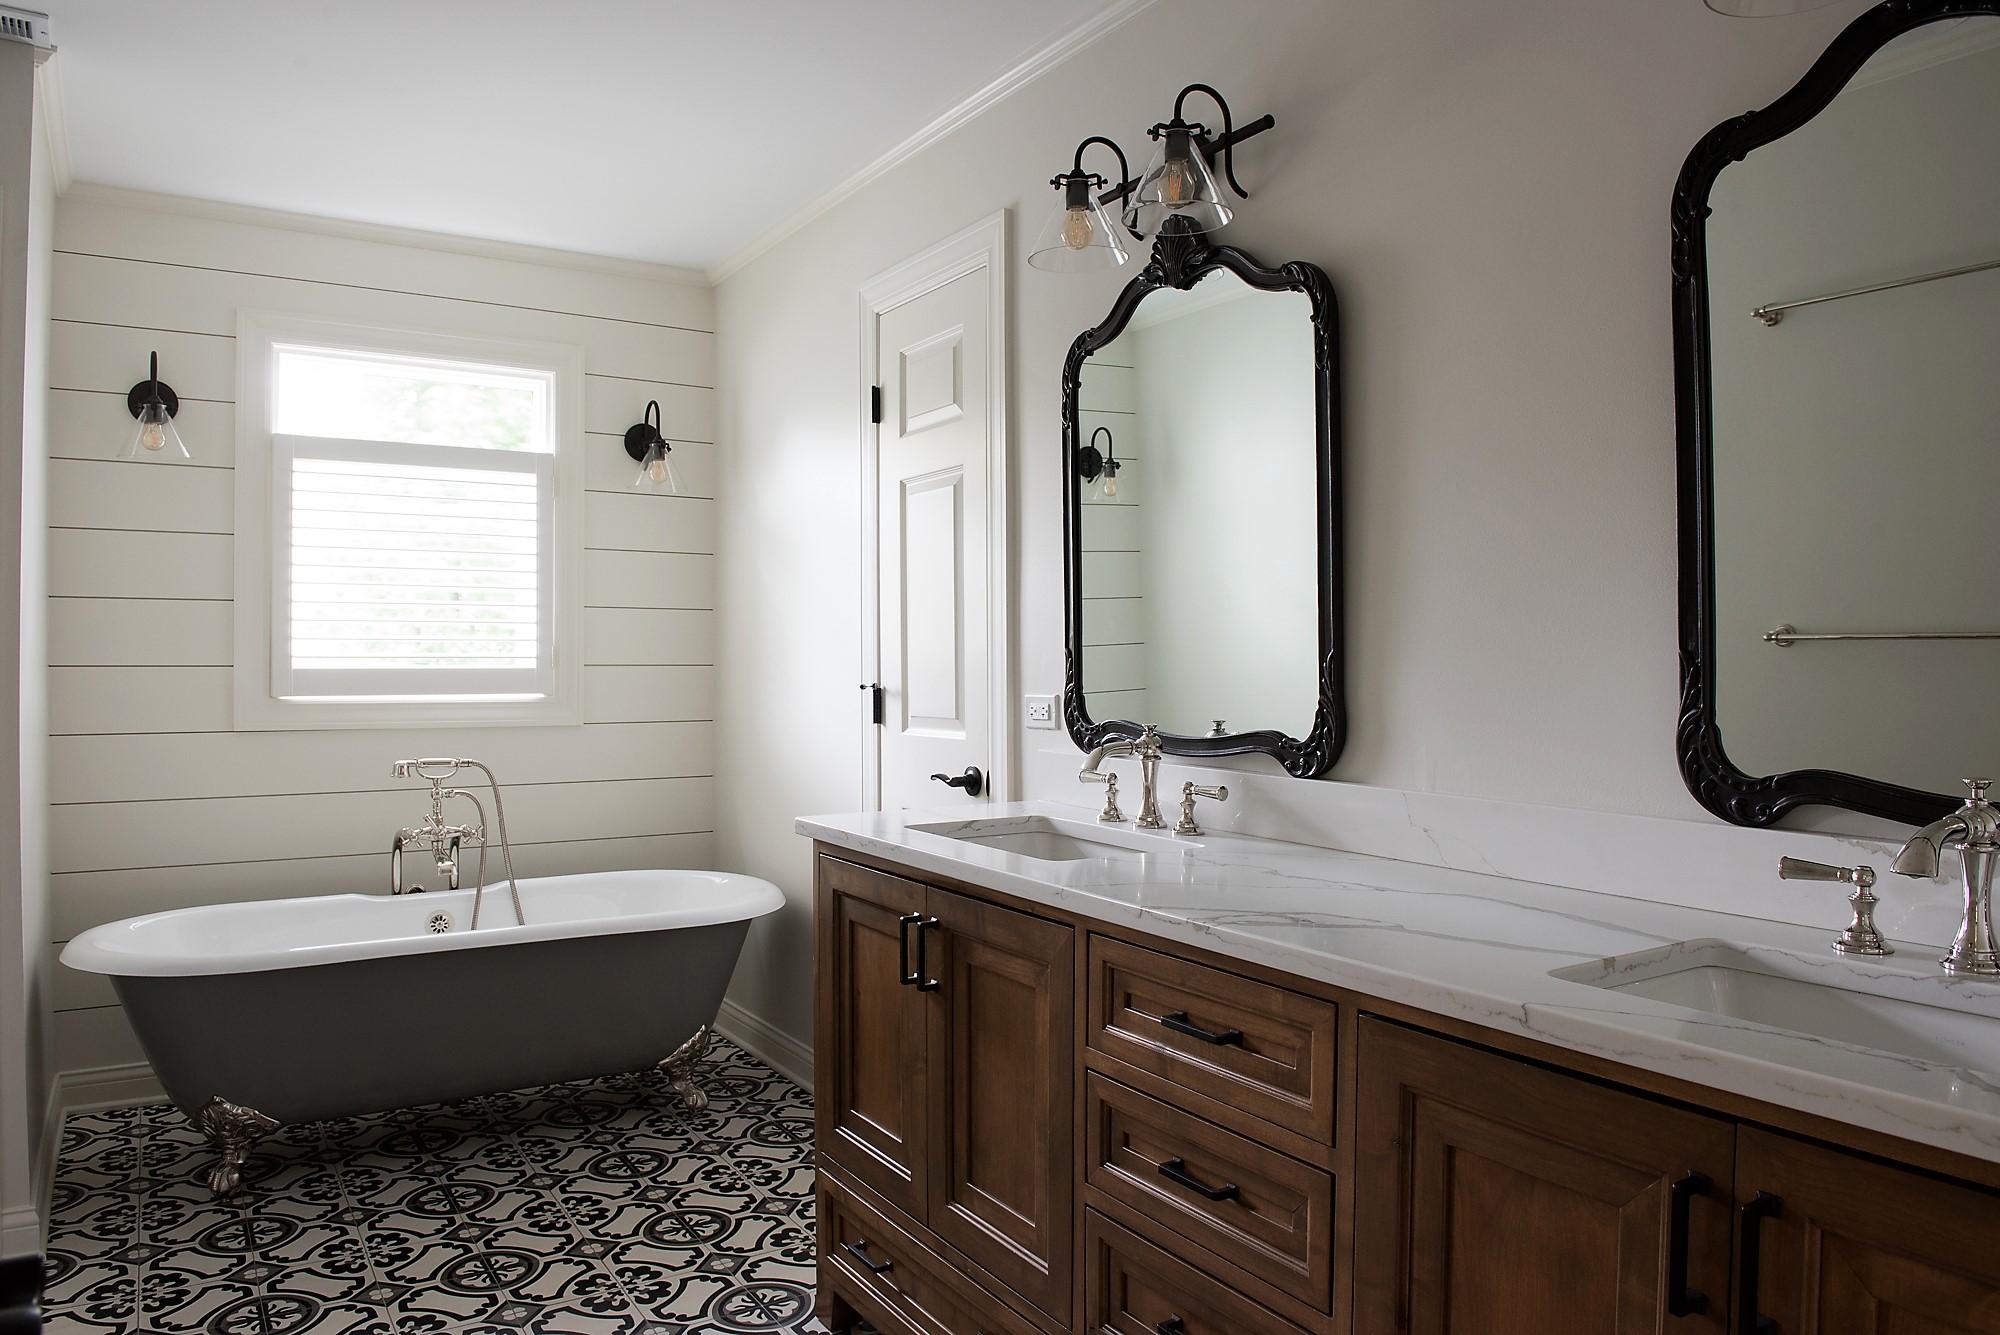 East Northshore Master Bathroom